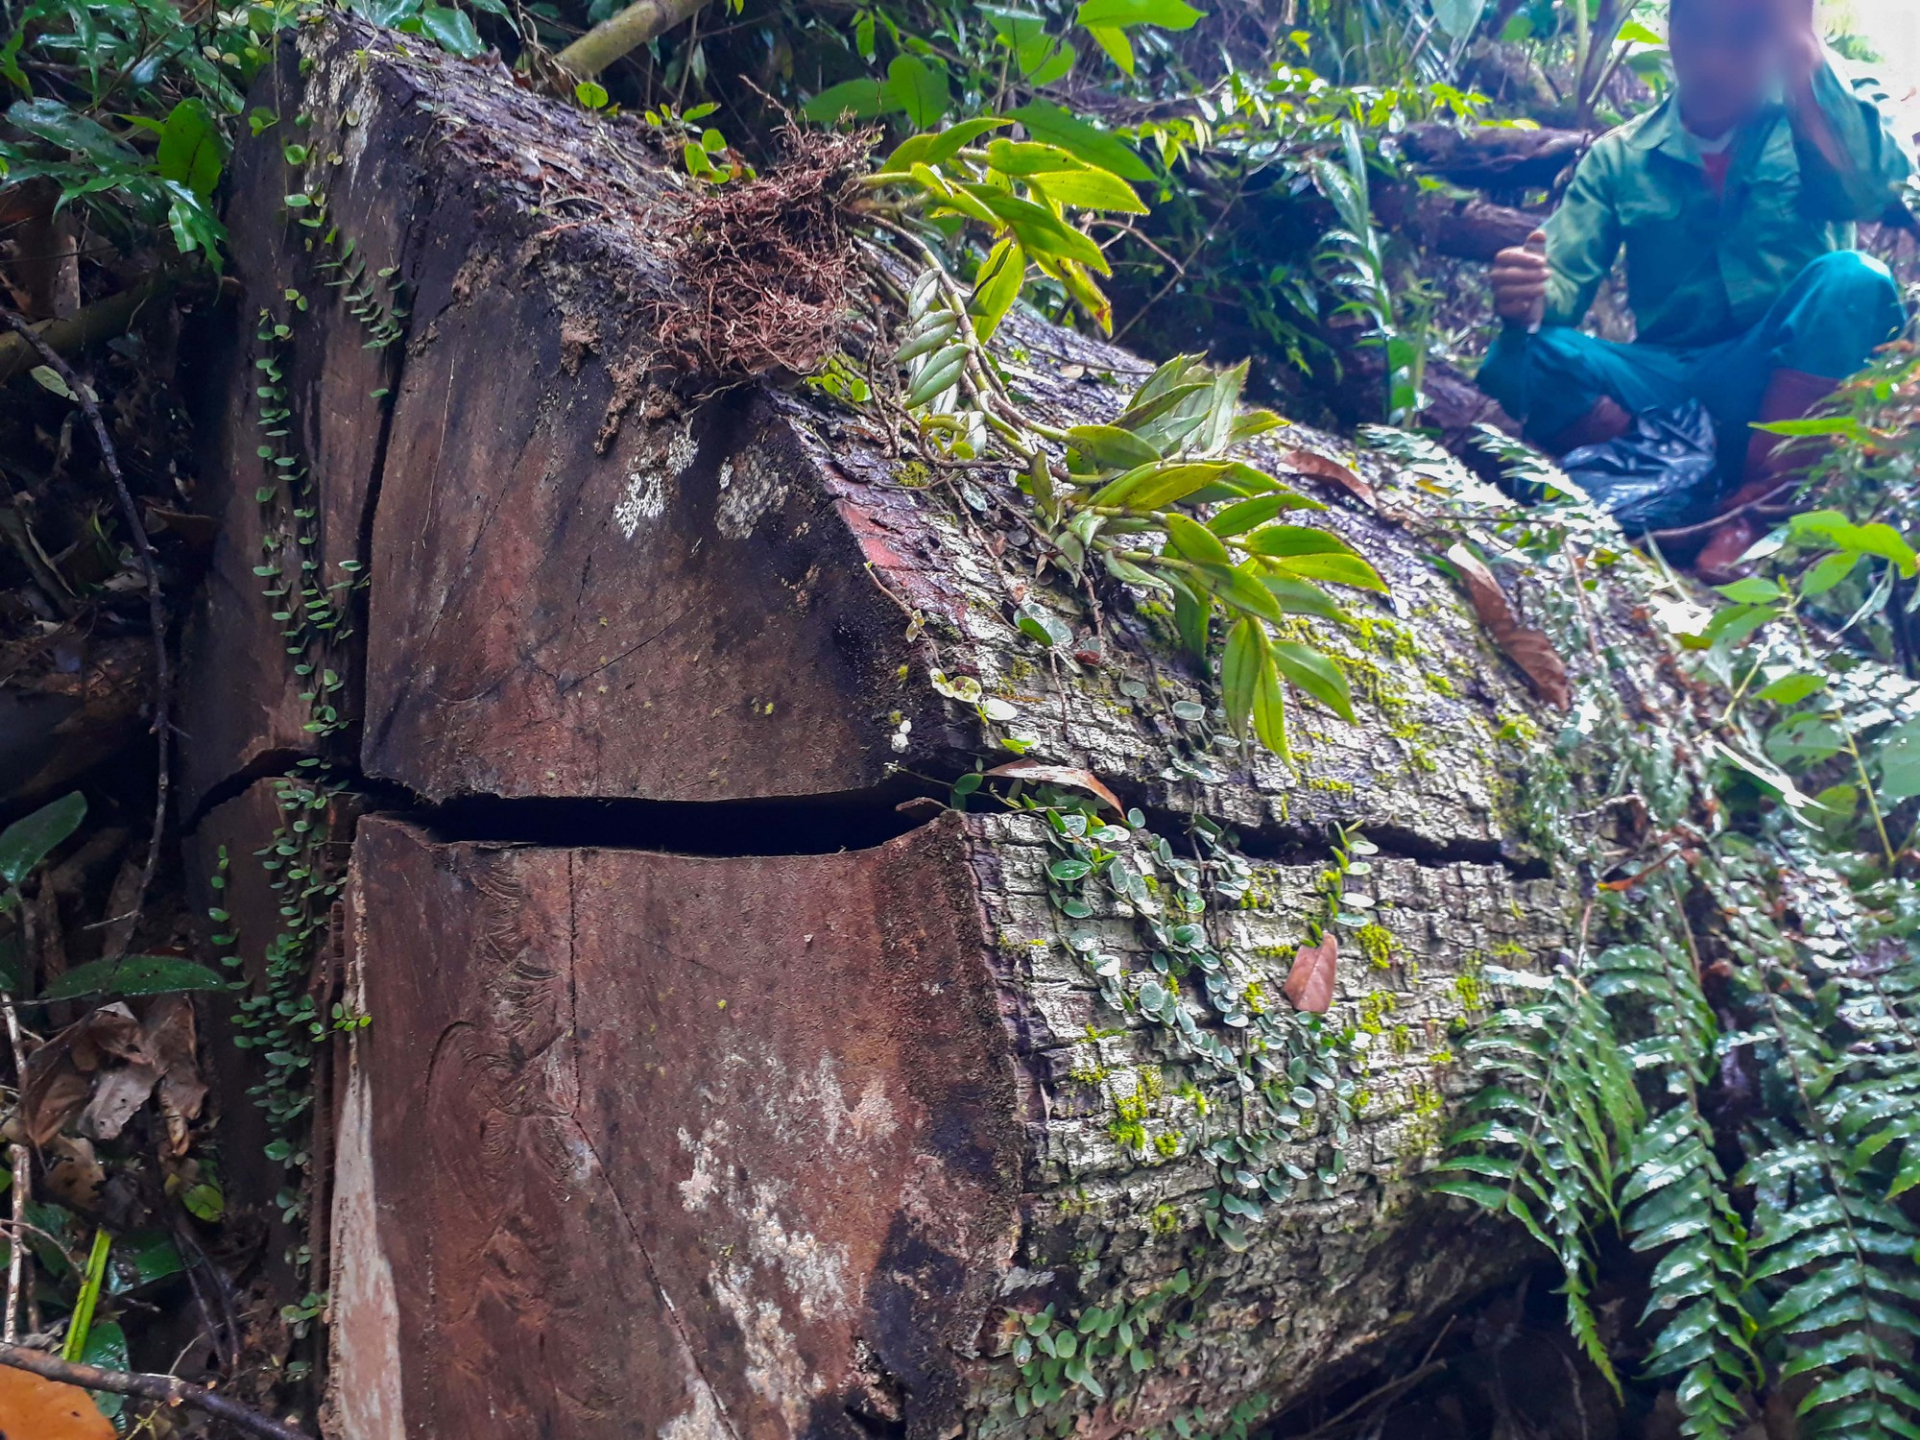 Protection forest devastated in northern Vietnam